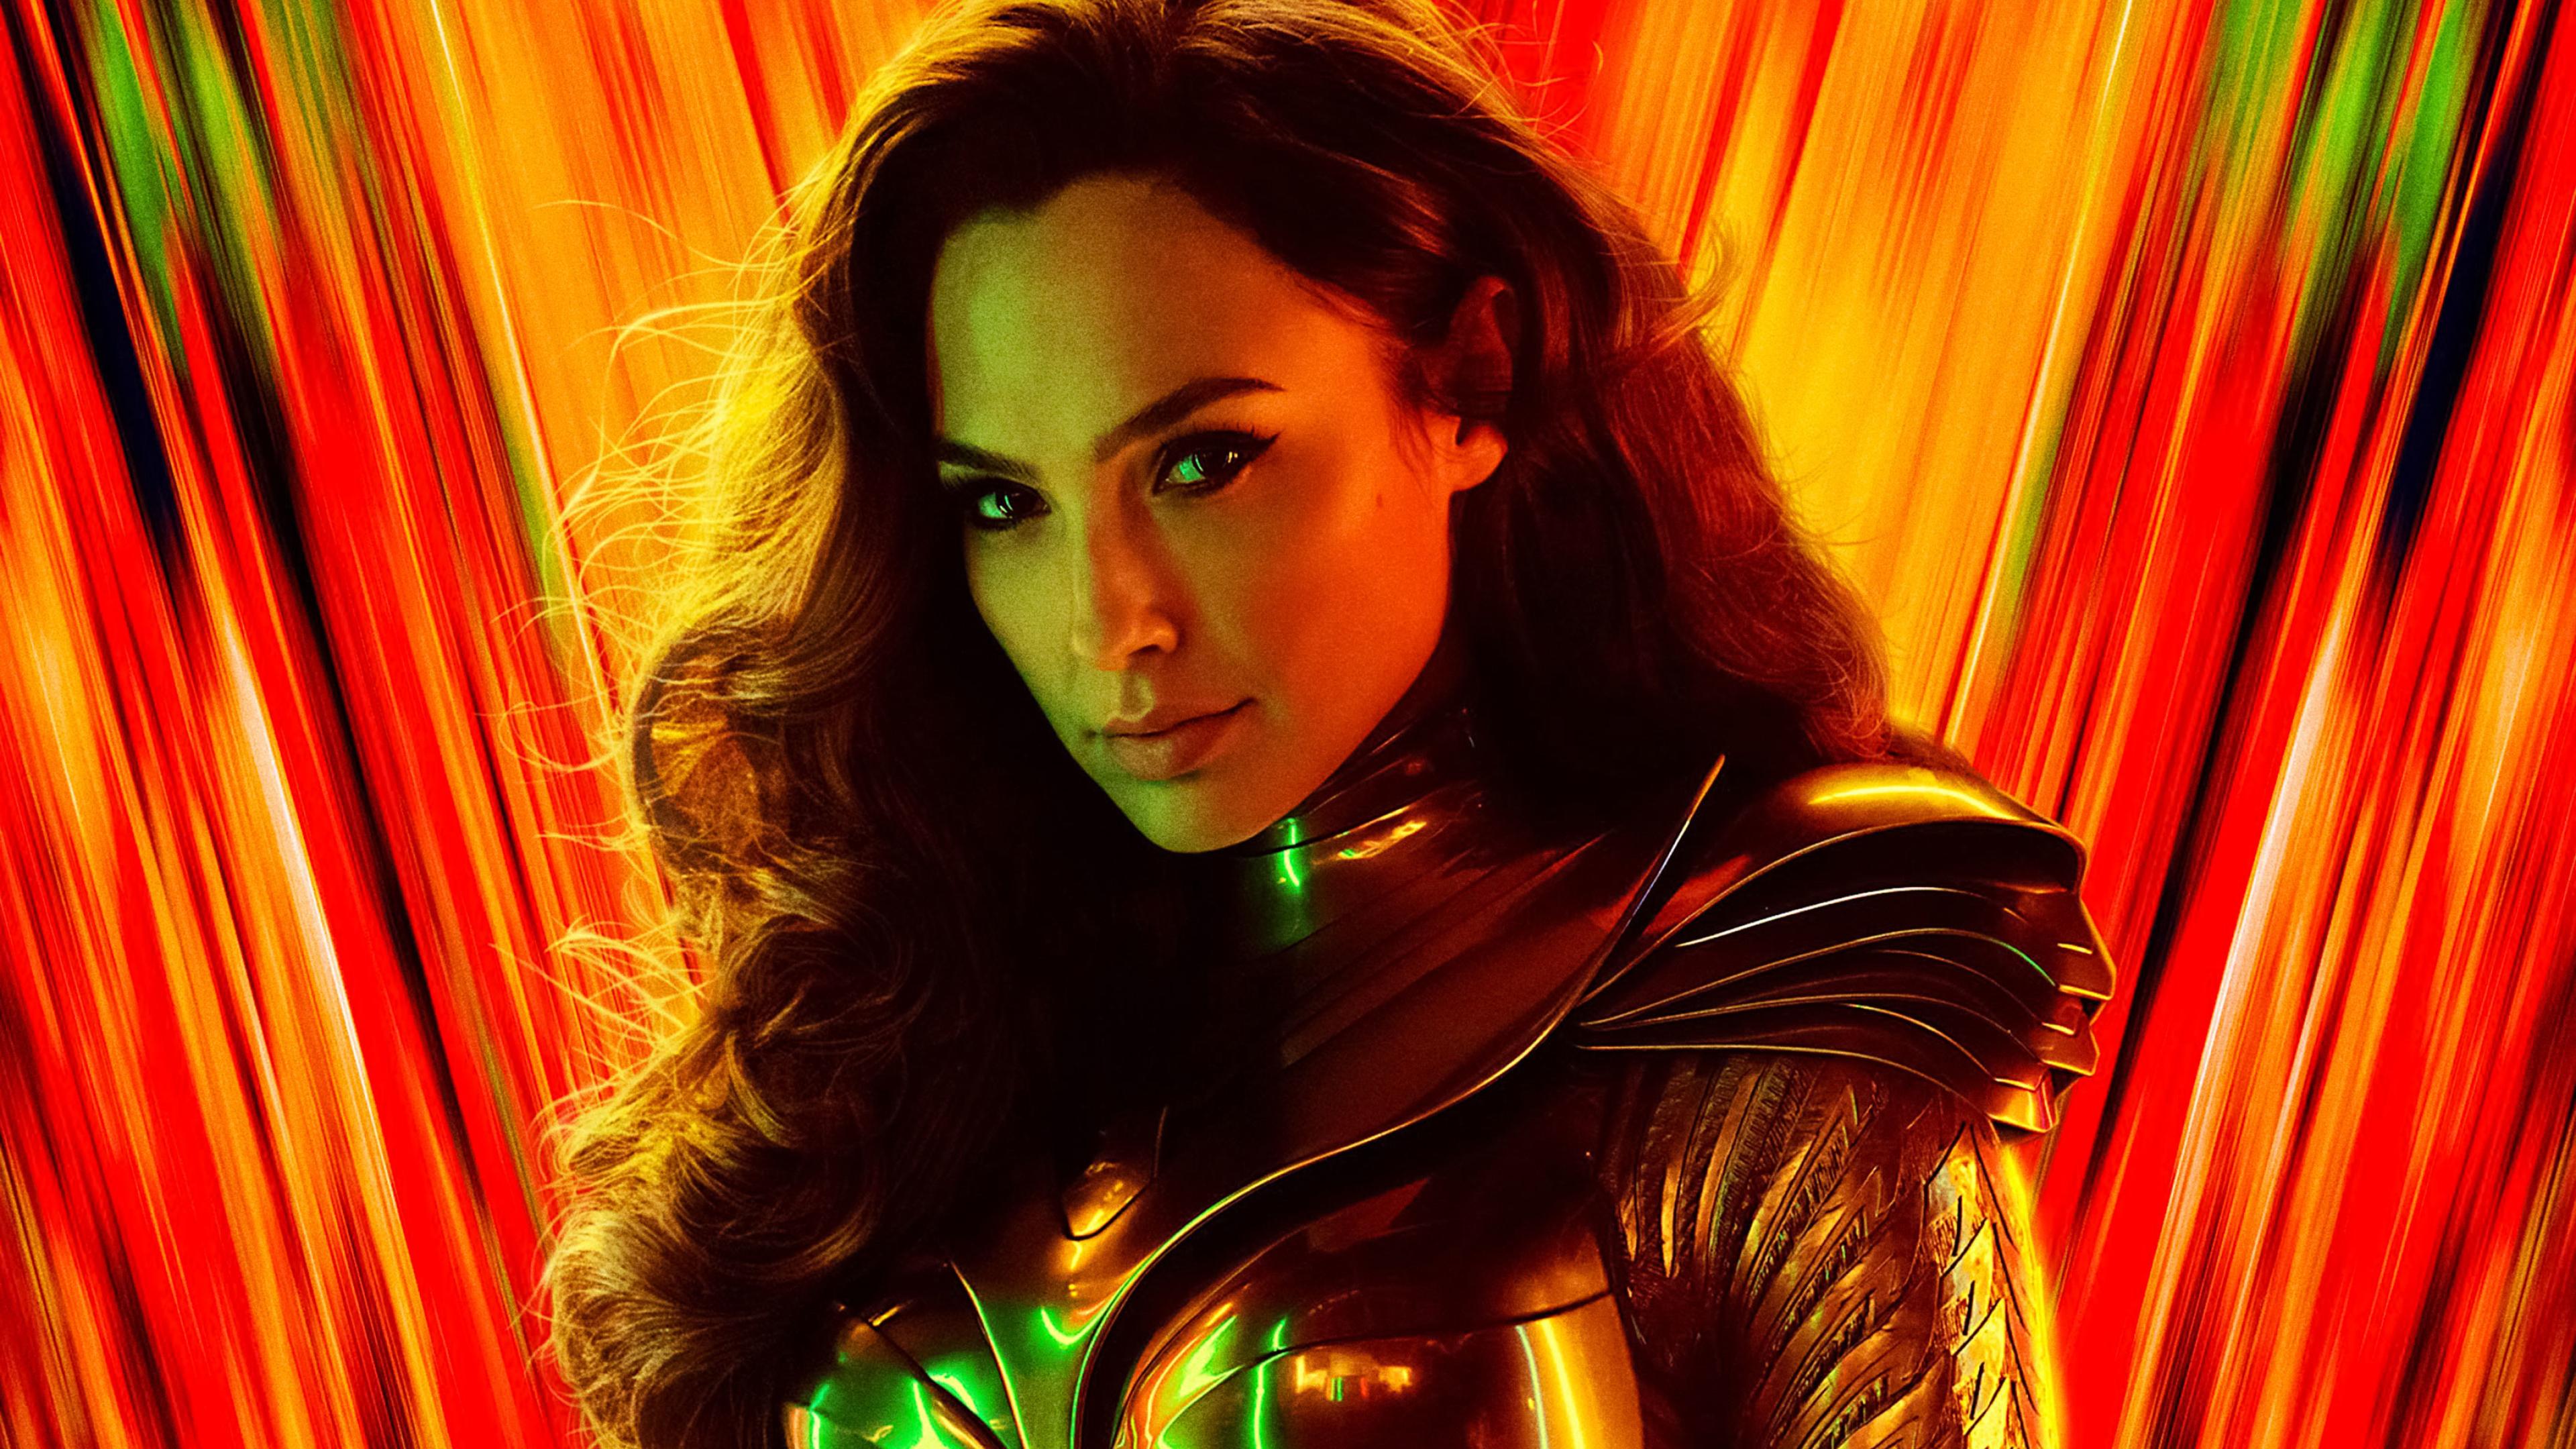 Wonder Woman 2 Wallpaper in 3840x2160 Resolution